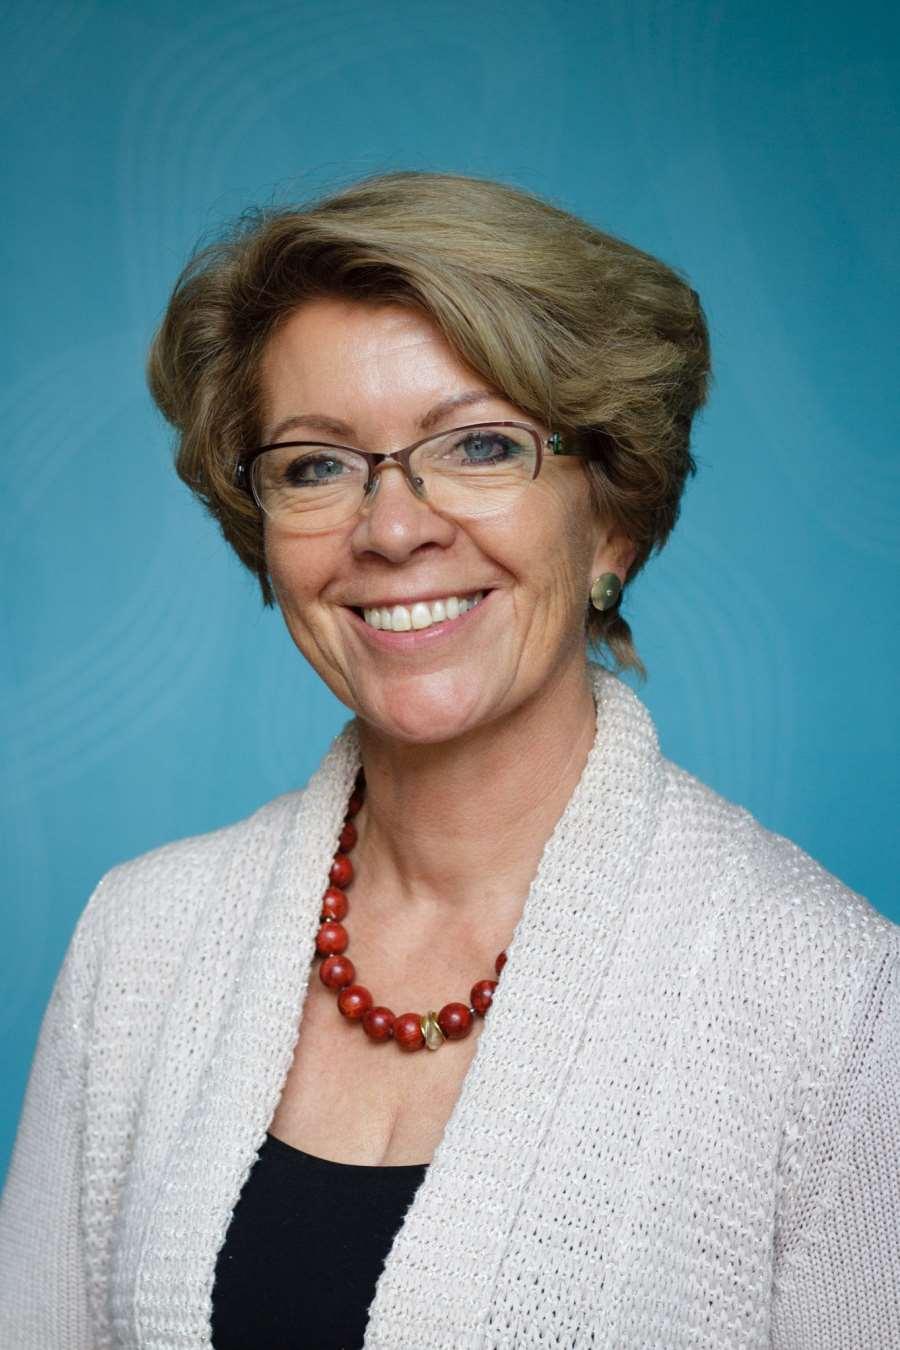 Åslaug Marie Haga New Chair of the PRIO Board